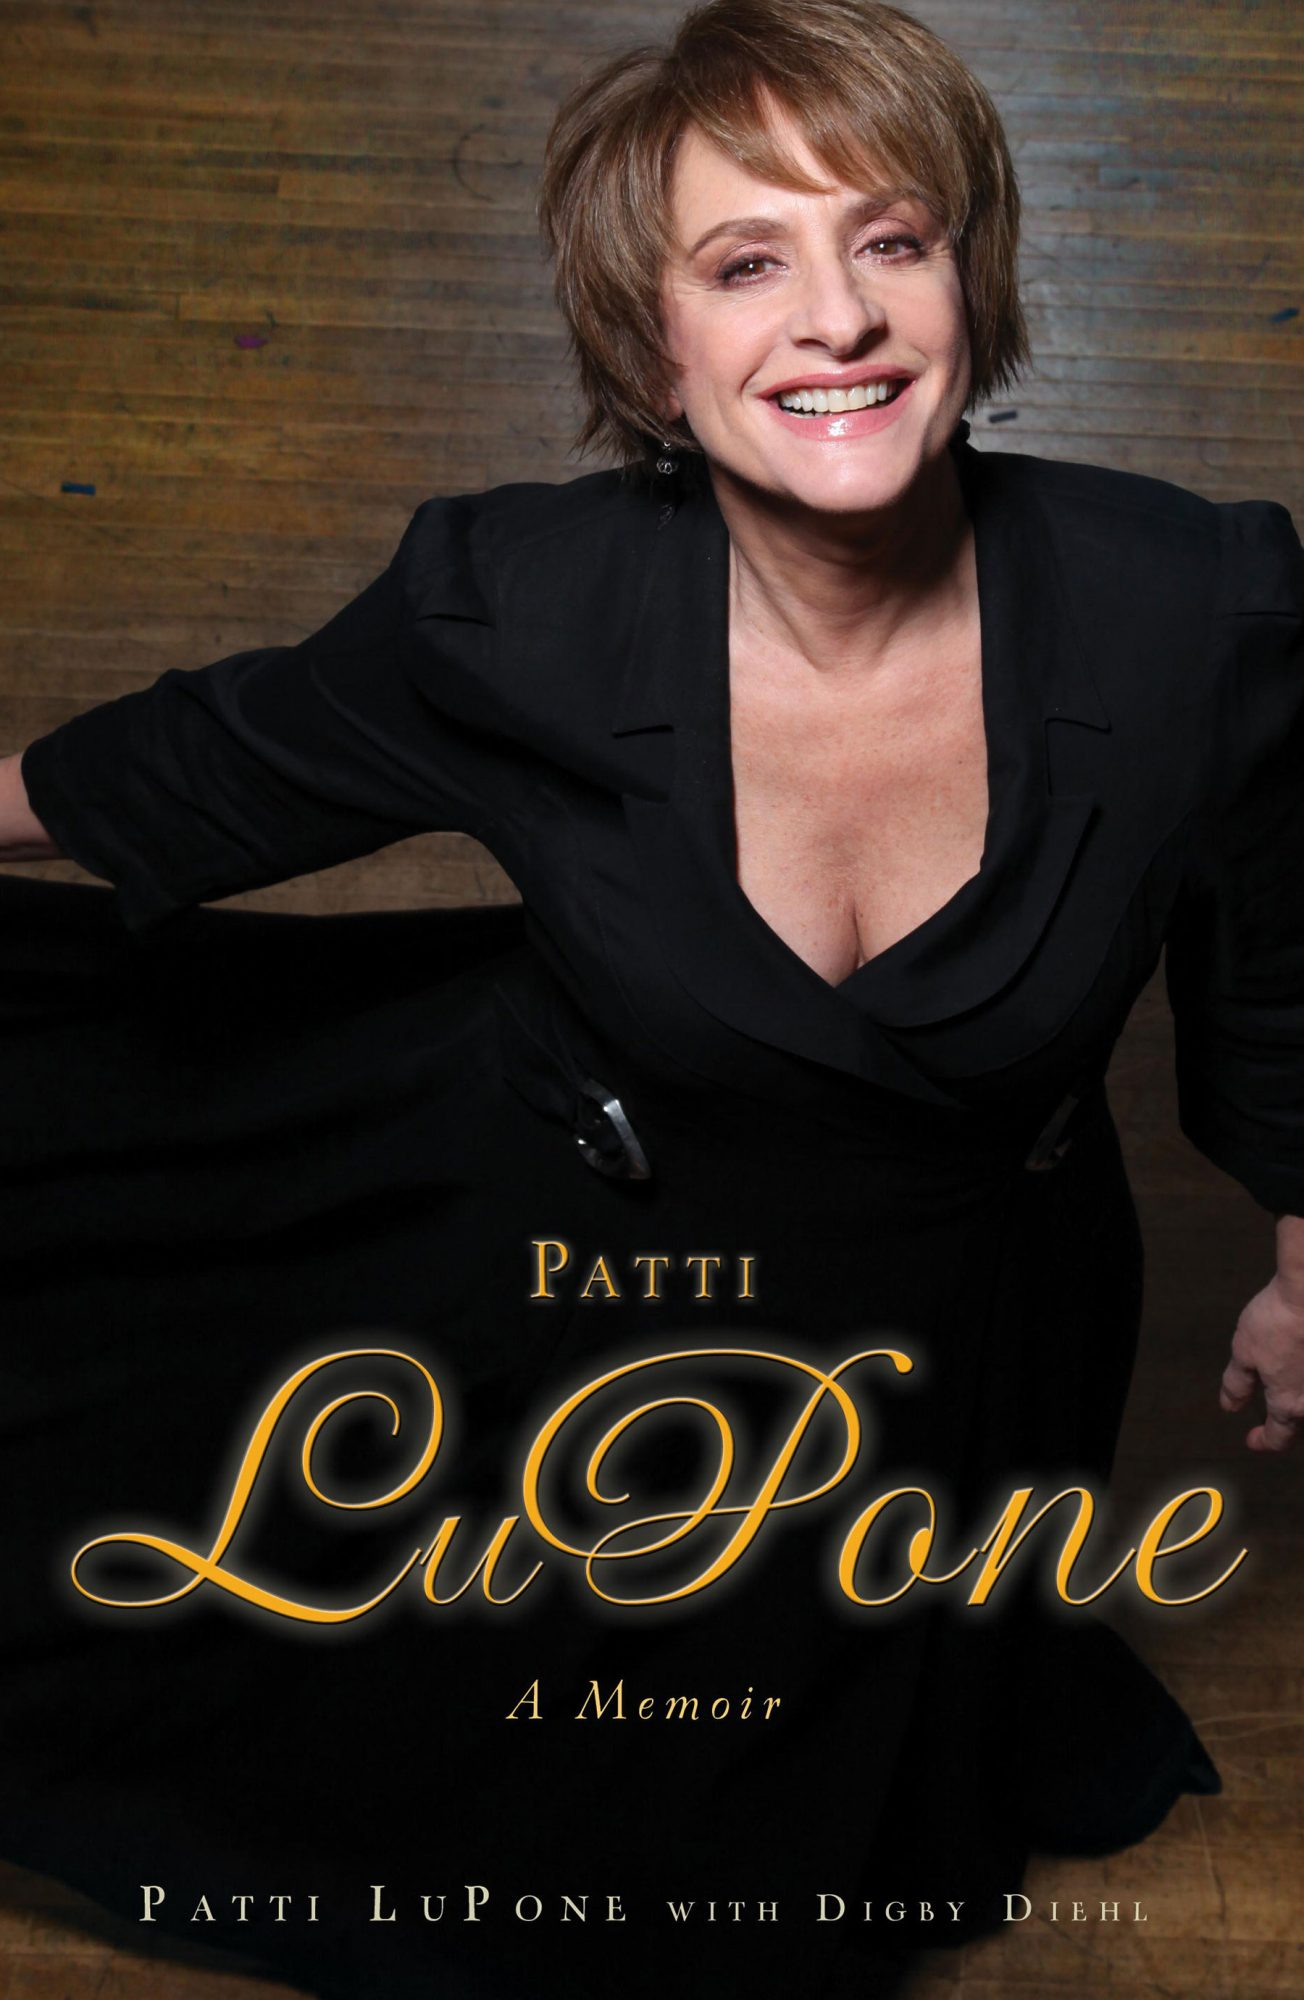 Patti LuPone: A Memoirby Patti LuPone